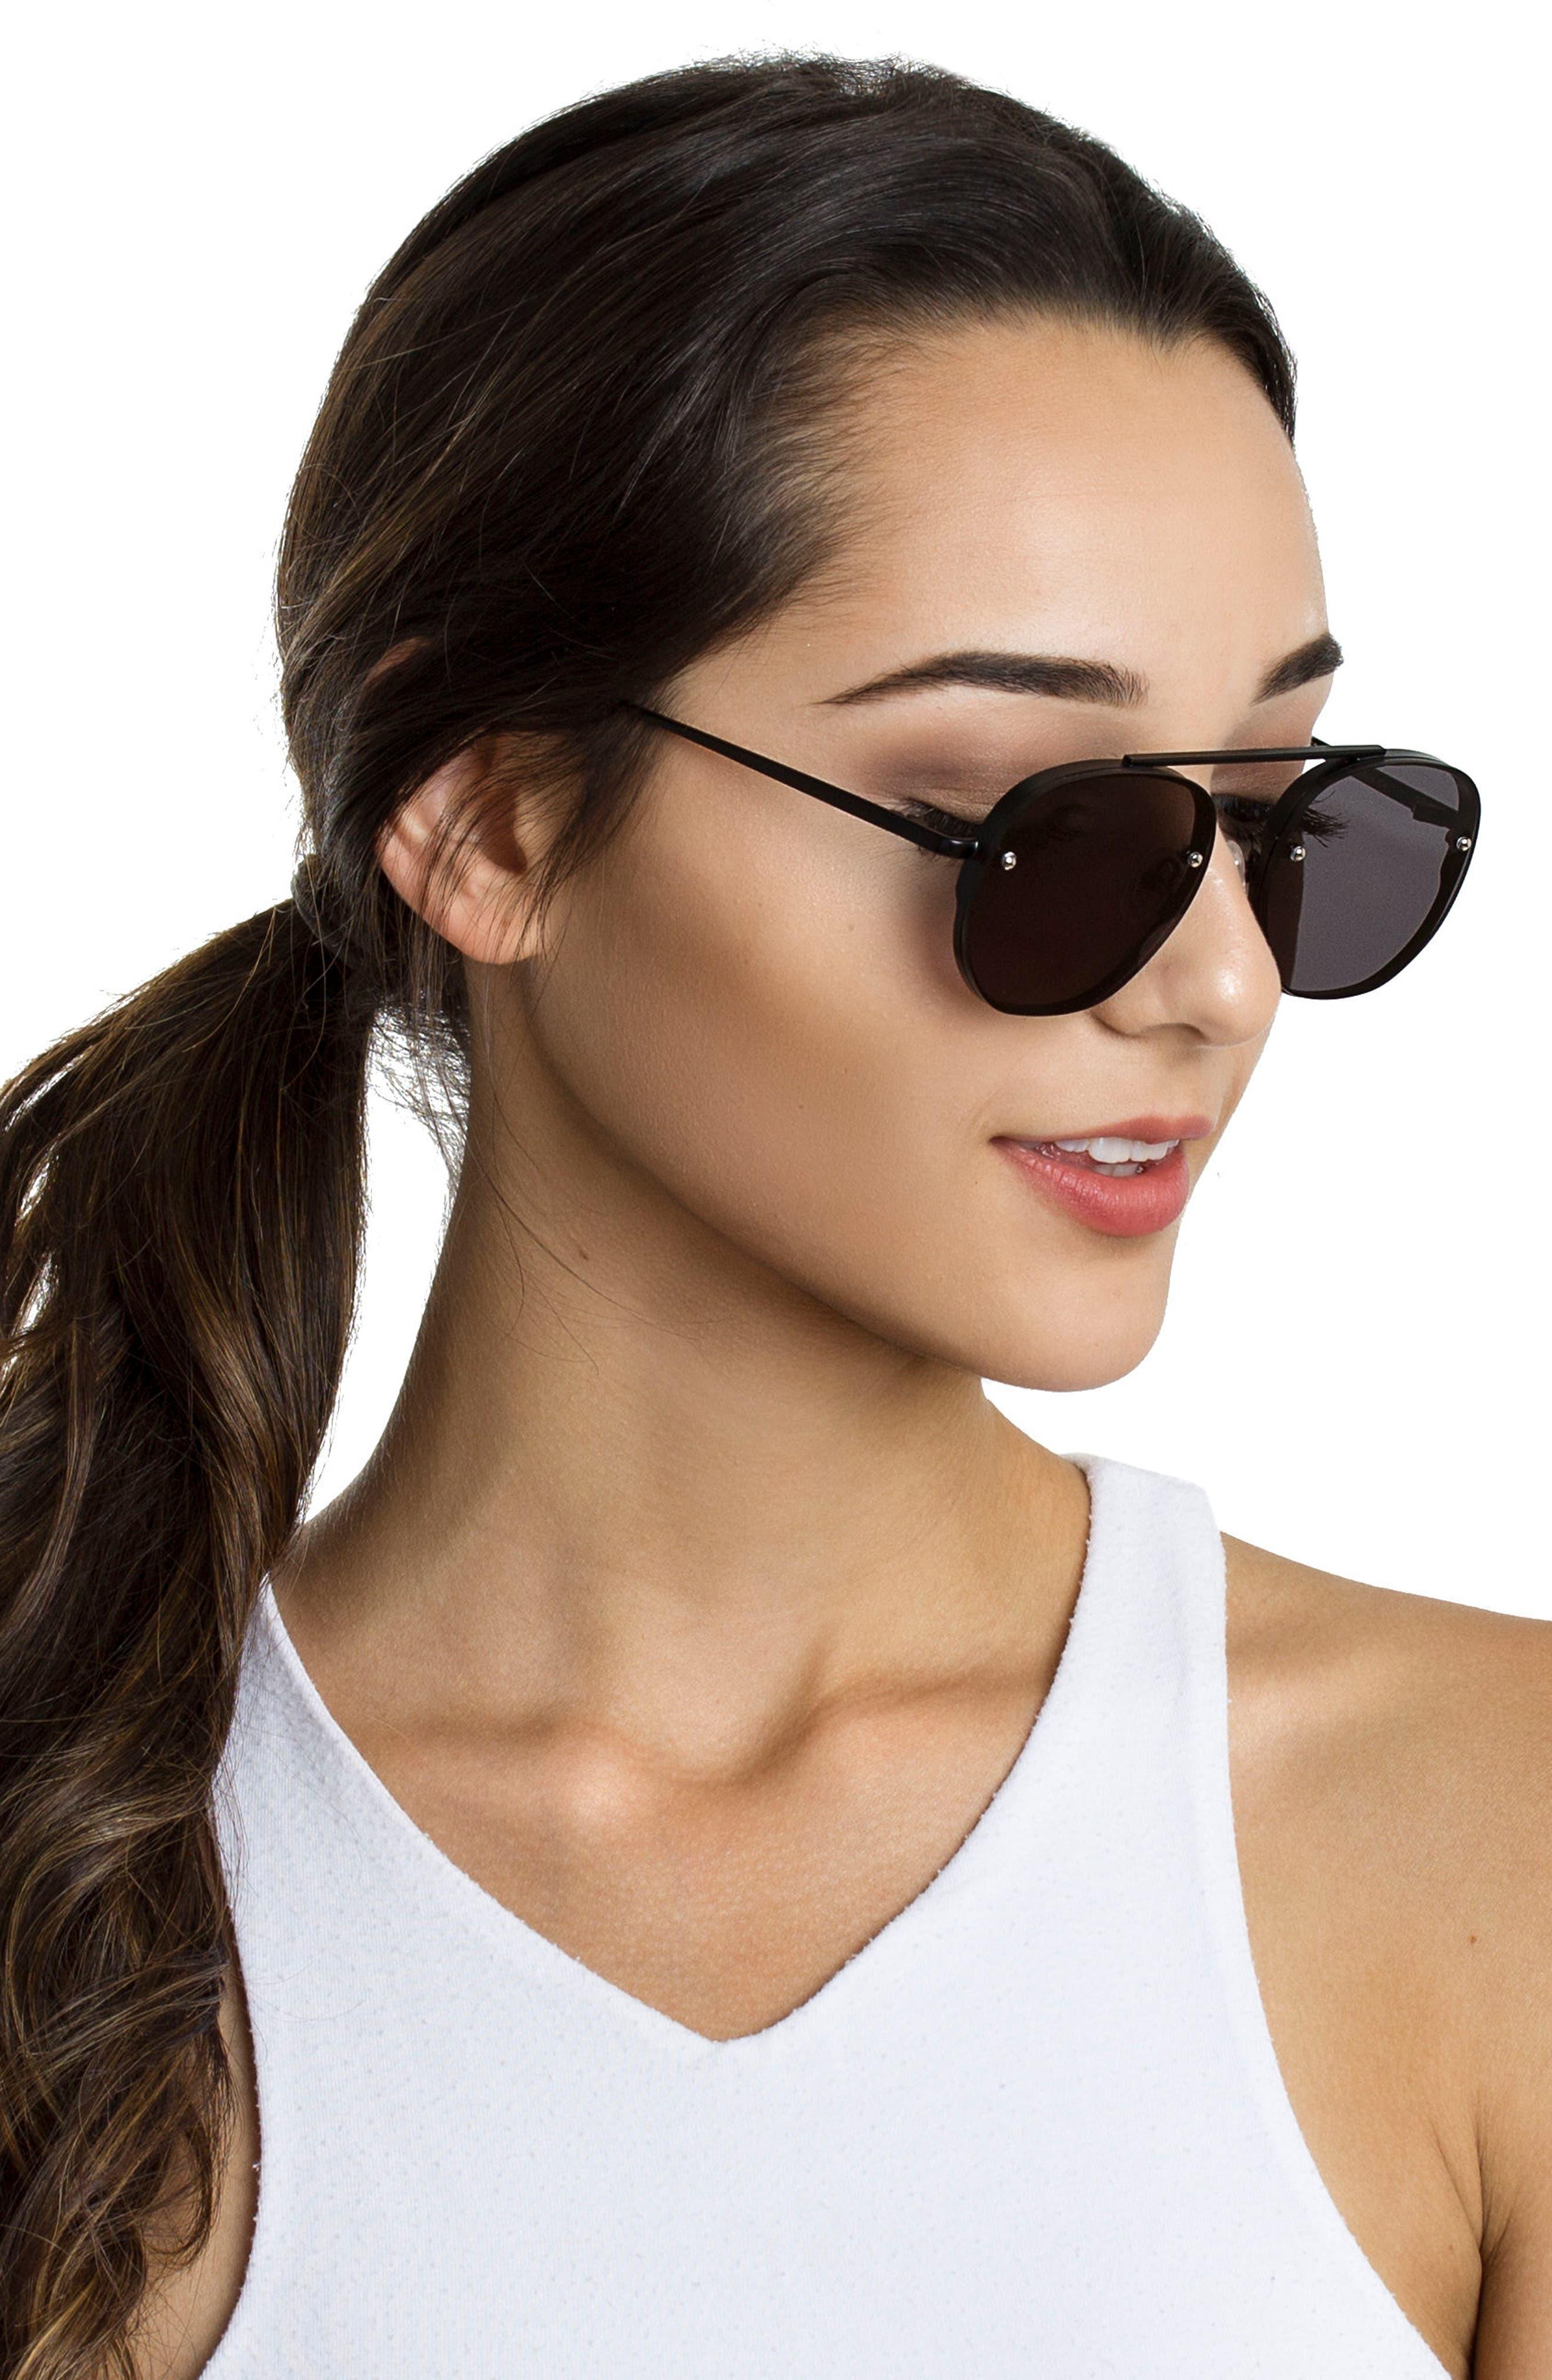 Traction 52mm Aviator Sunglasses,                             Alternate thumbnail 2, color,                             Gravity Black